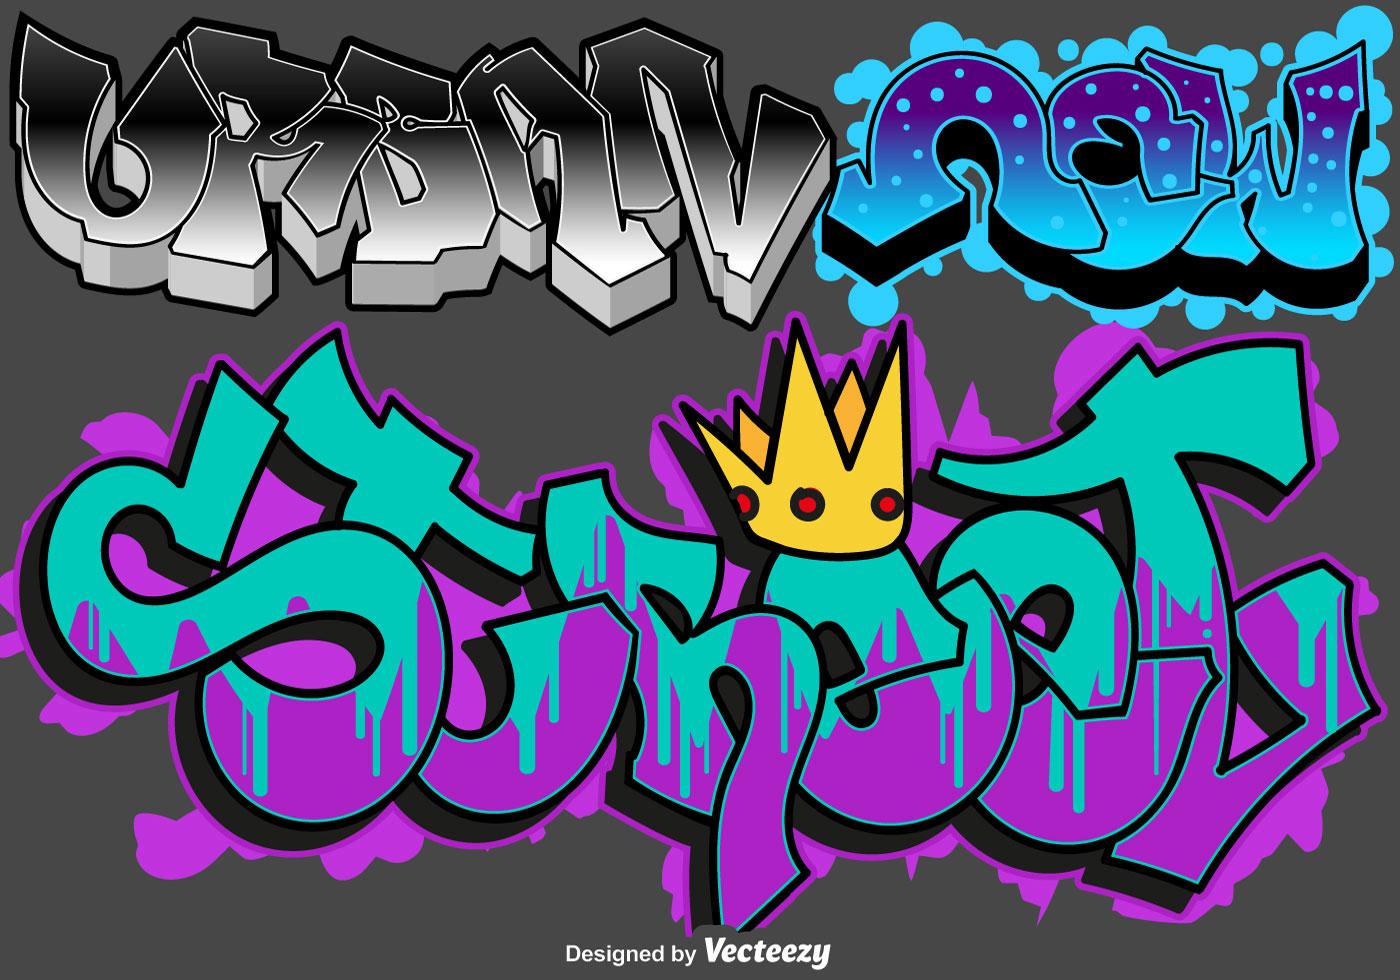 Vector graffiti urban art set download free vector art stock graphics images